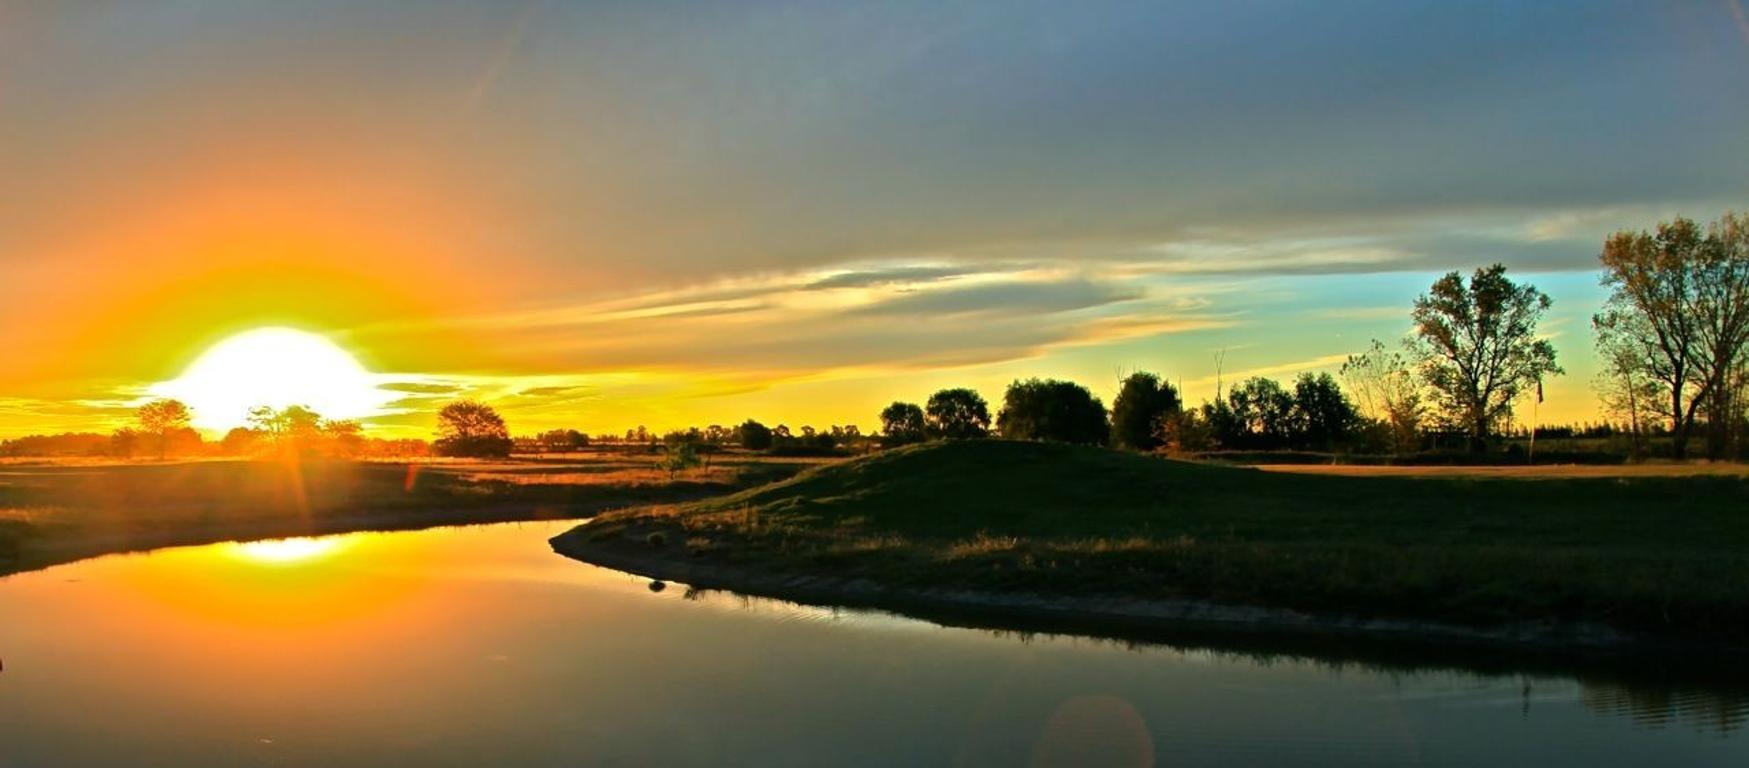 Tizado Pilar vende lotes al golf en Medal CC, Pilar y Alrededores - PIL3849_LP172603_1